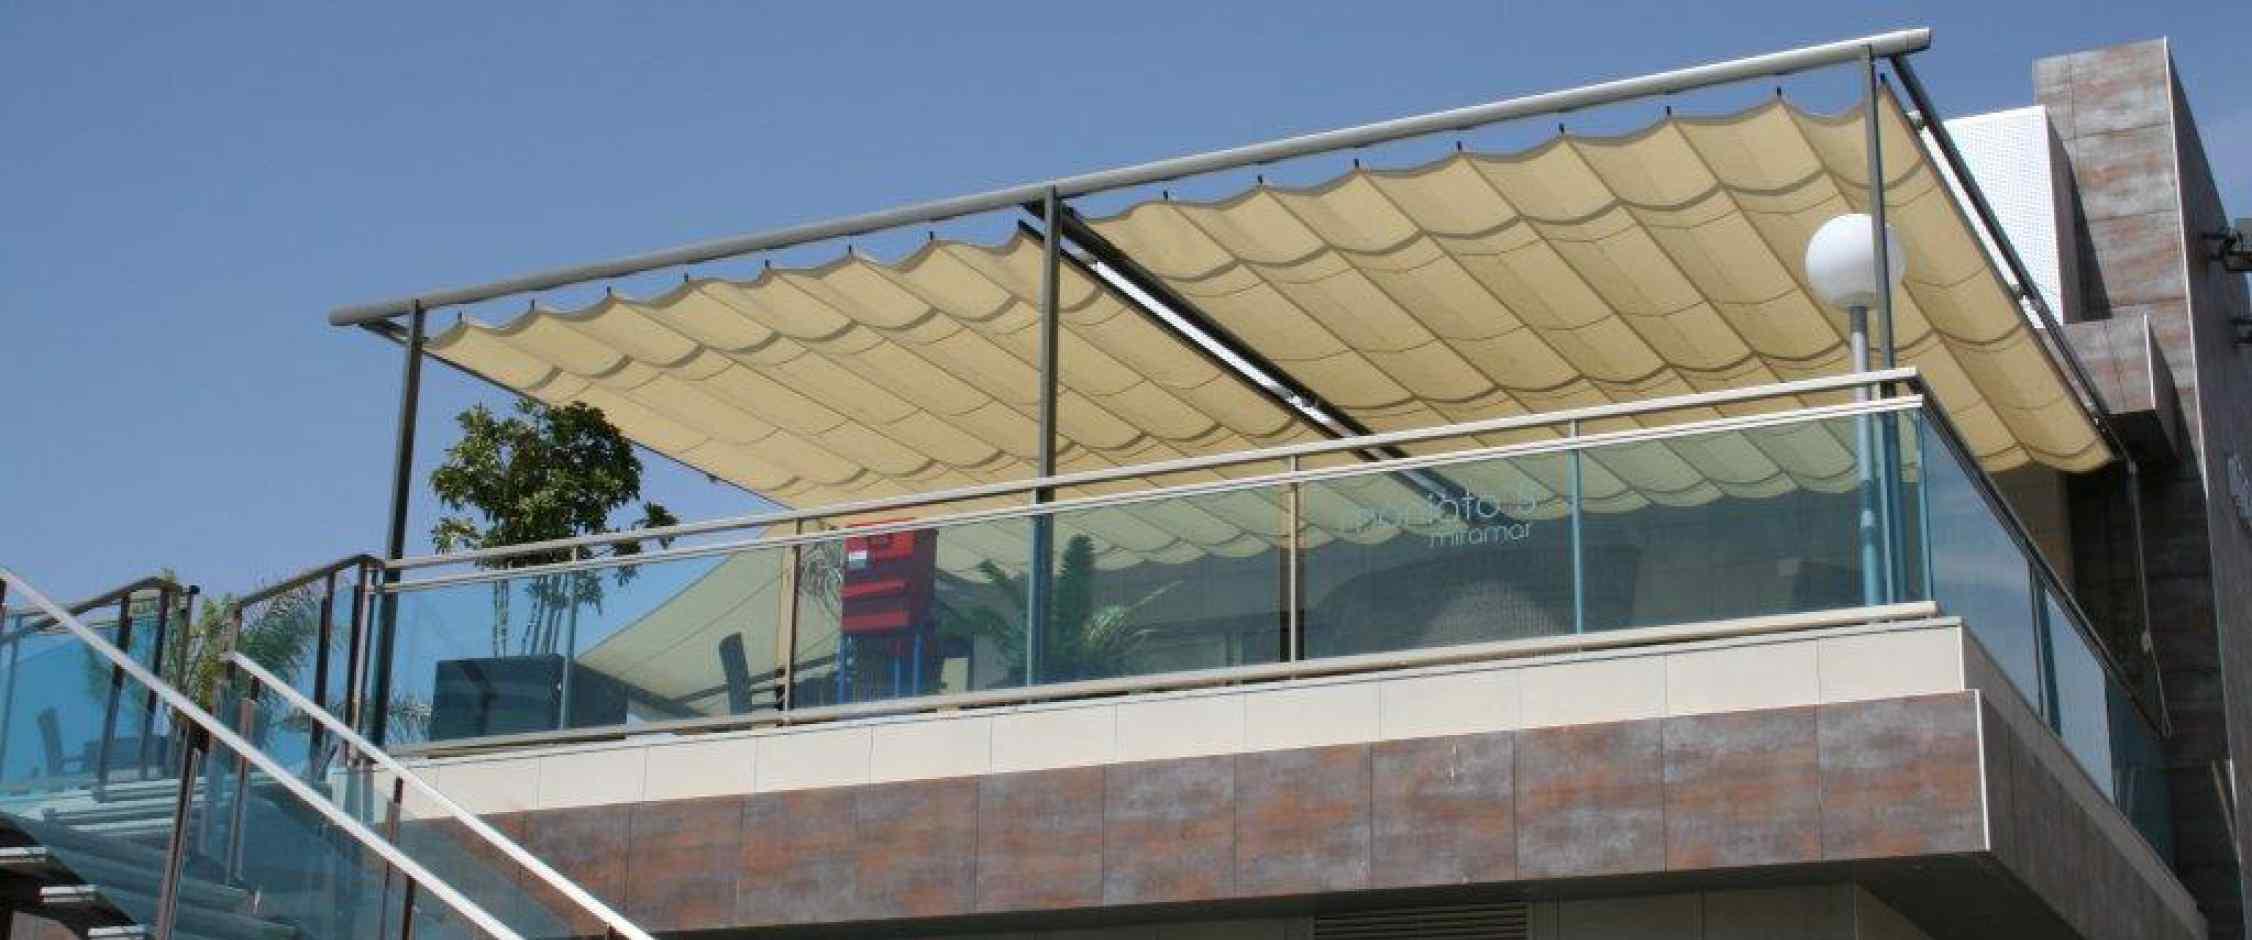 Toldo plano zen torretoldo - Toldos impermeables para terrazas ...